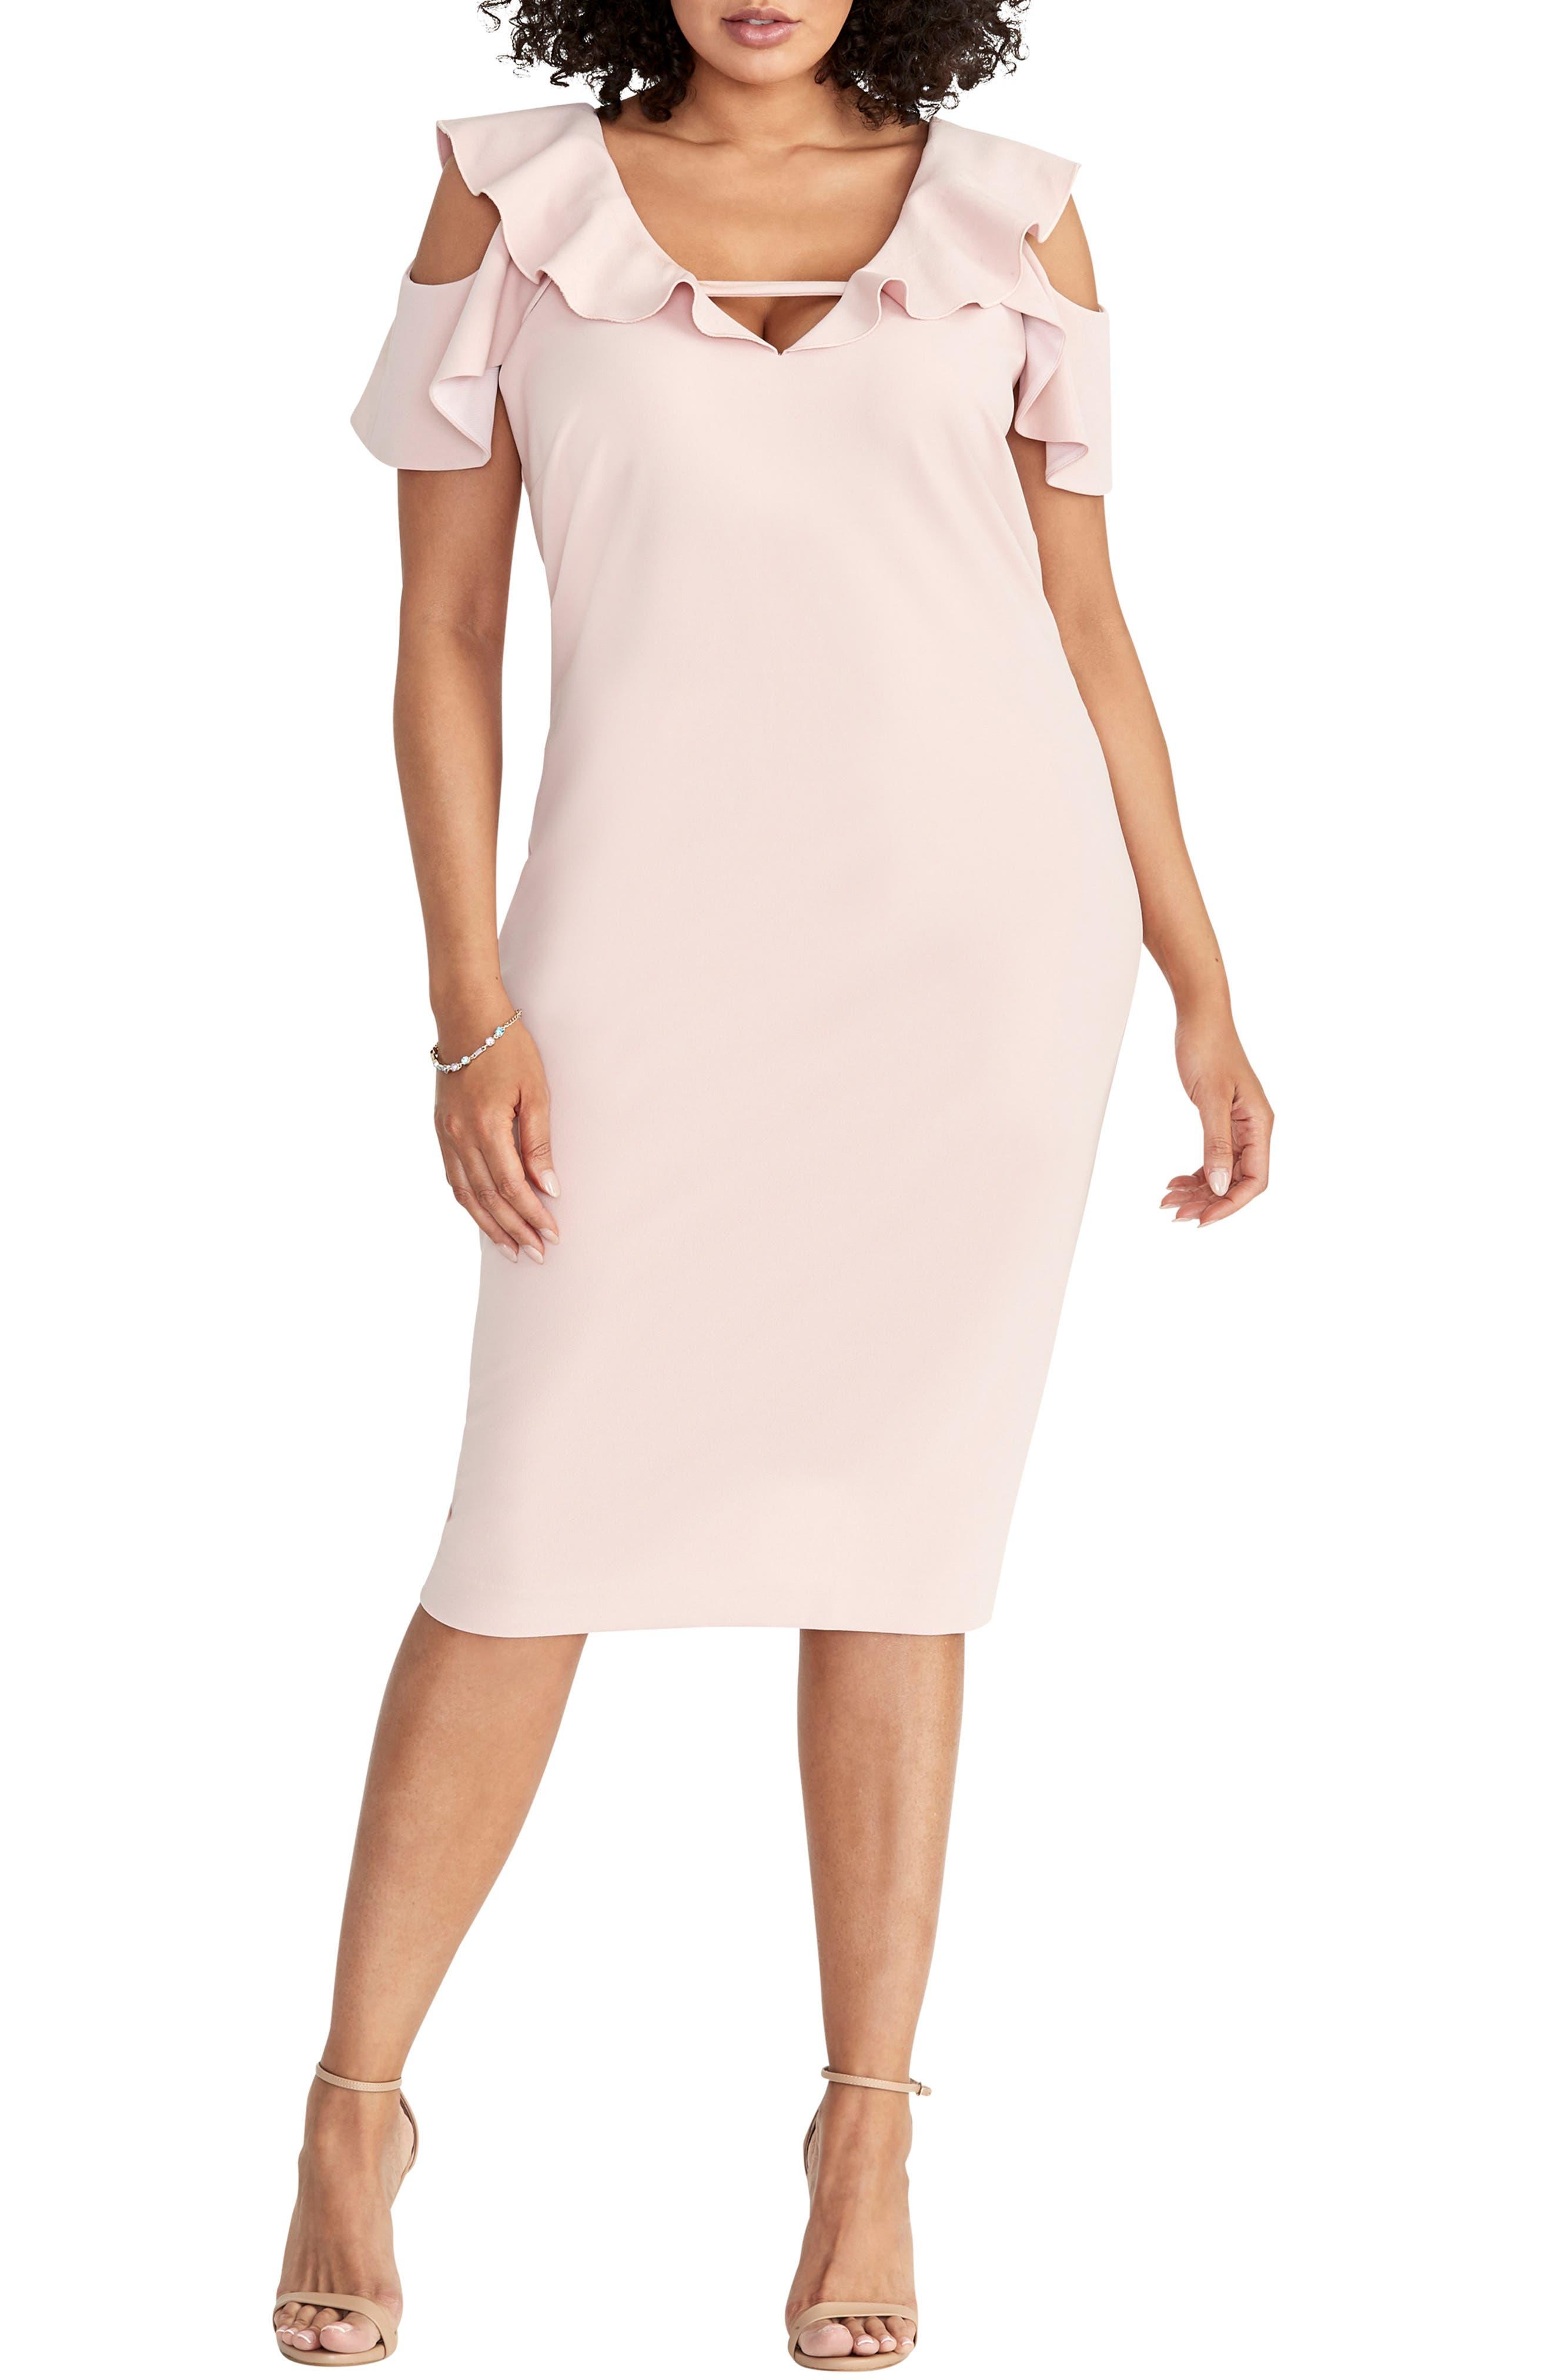 Plus Size Rachel Rachel Roy Ruffled Cold Shoulder Sheath Dress, Pink